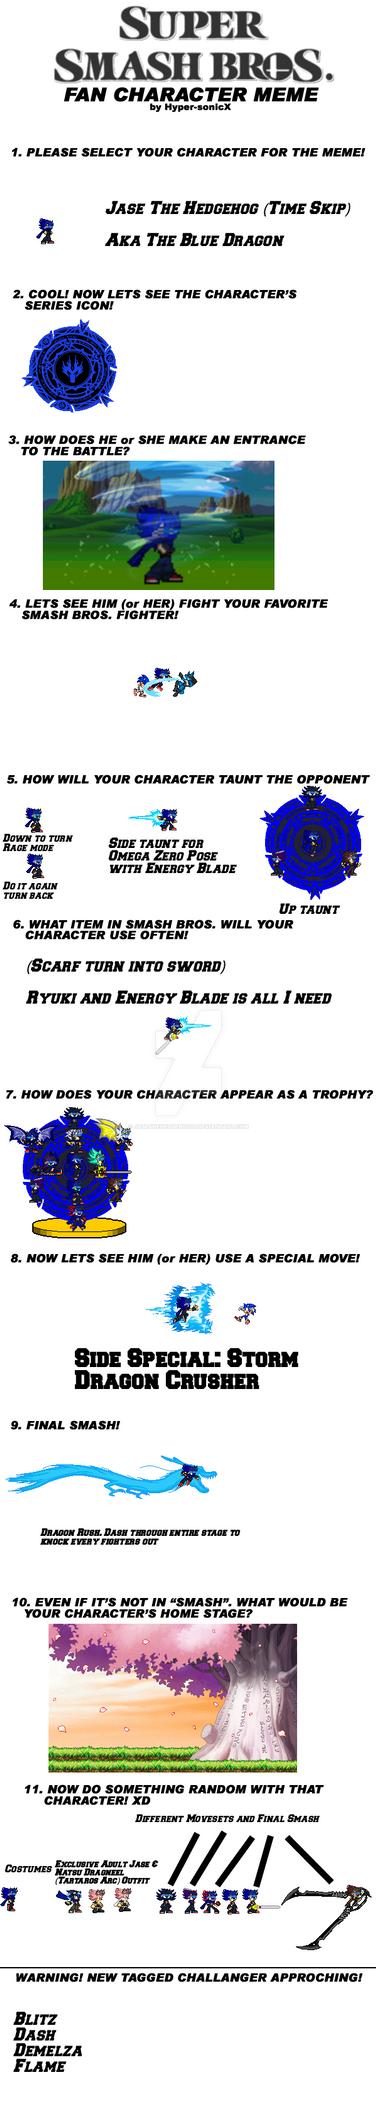 Smash Bros Jase (Time Skip) meme by JaseTheHedgehog16